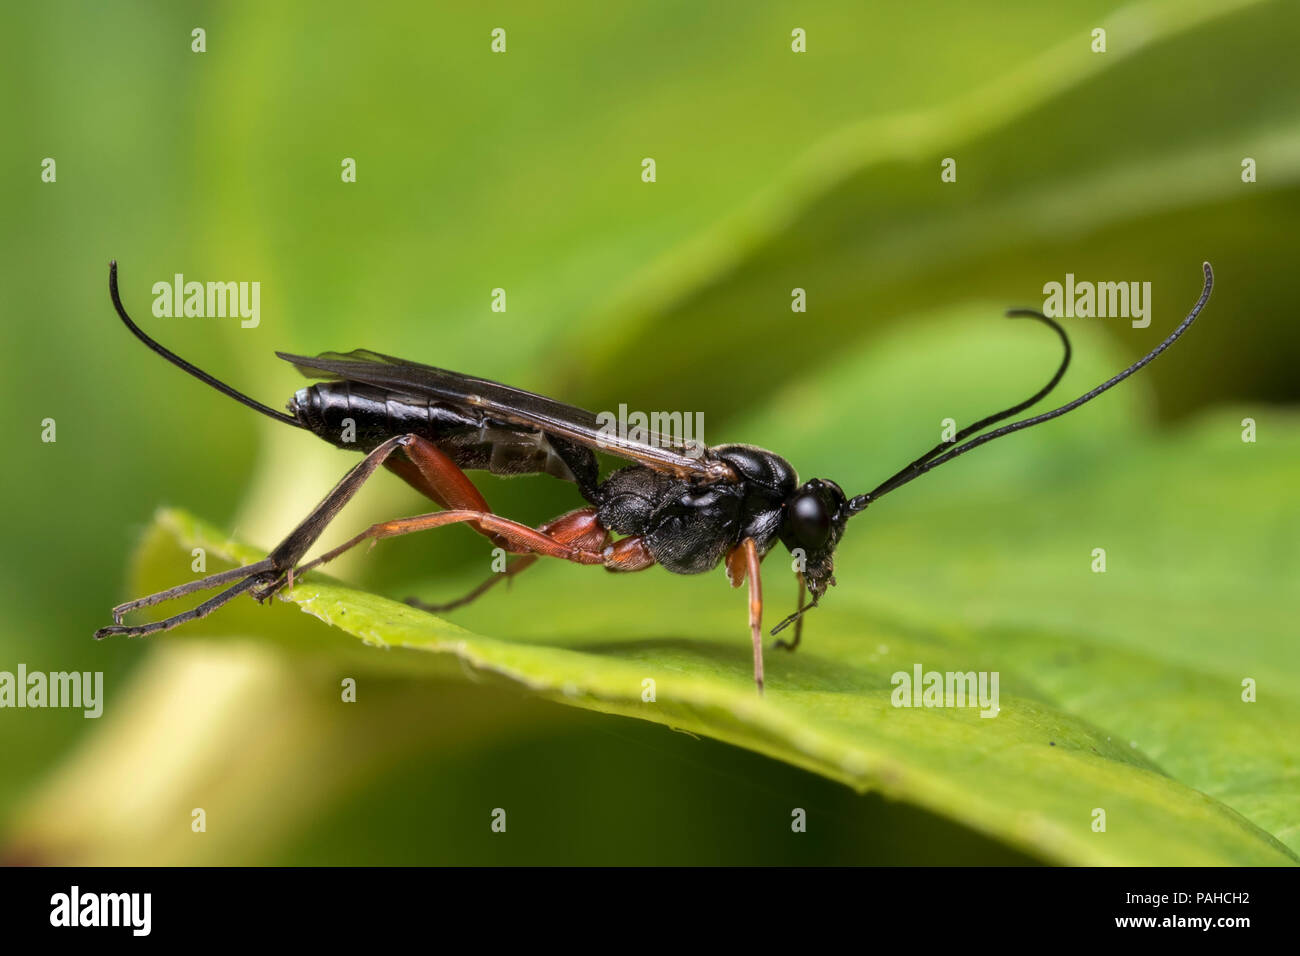 Ichneumonid Wasp resting on bramble leaf. Tipperary, Ireland - Stock Image